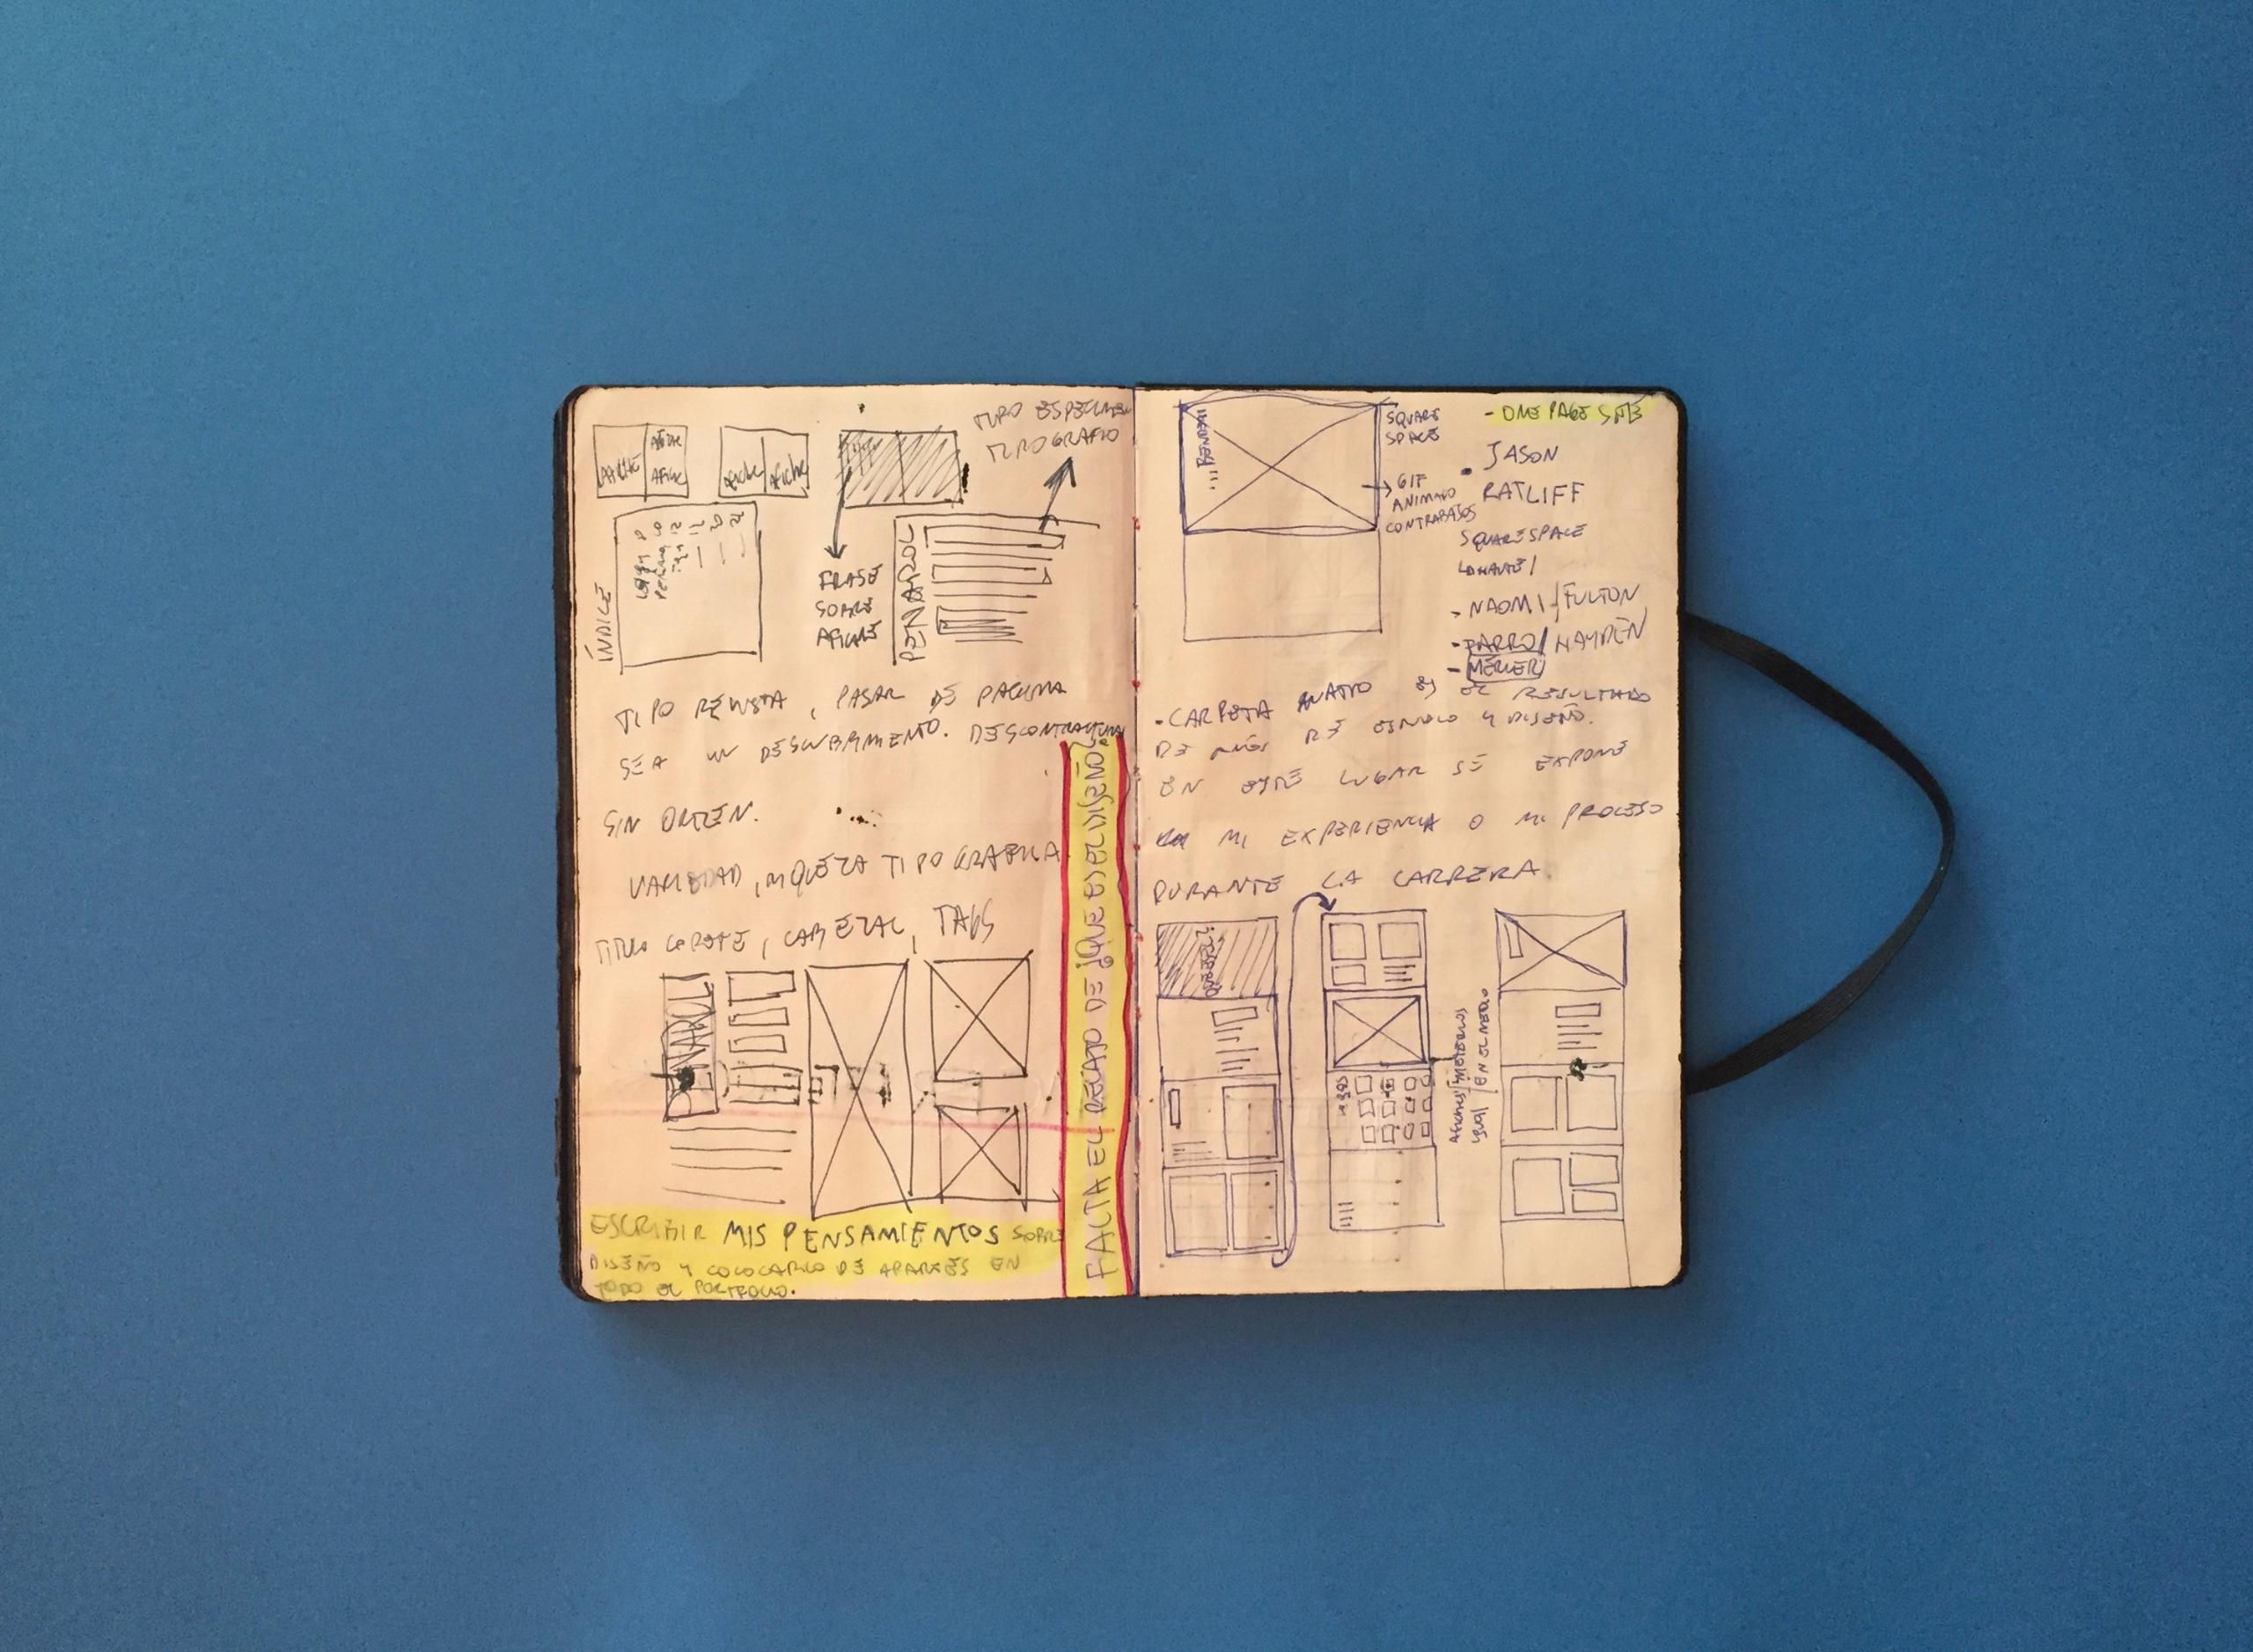 063 - mypadmypens, pen, pencil, sketchbook - benderski | ello